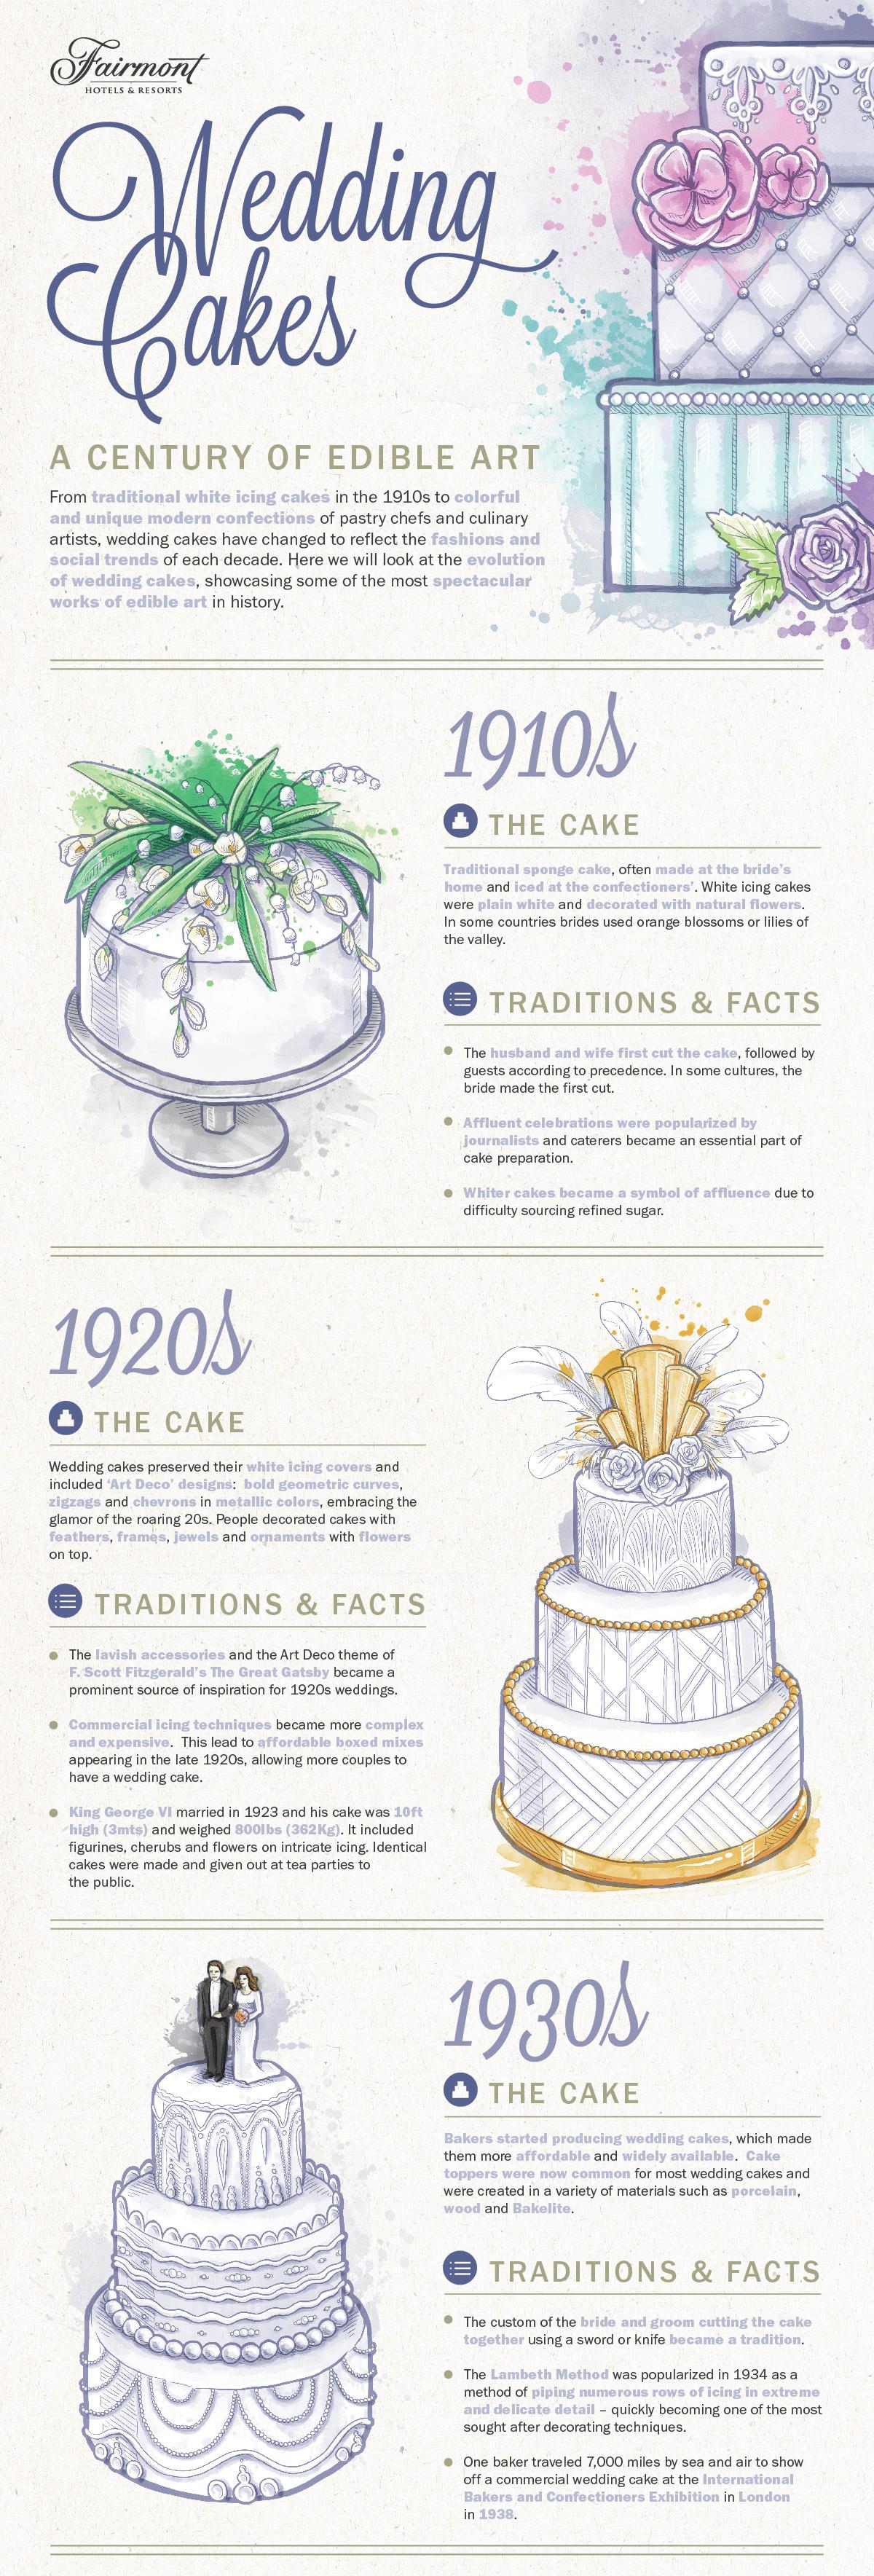 History Of Wedding Cakes Fairmont Hotels